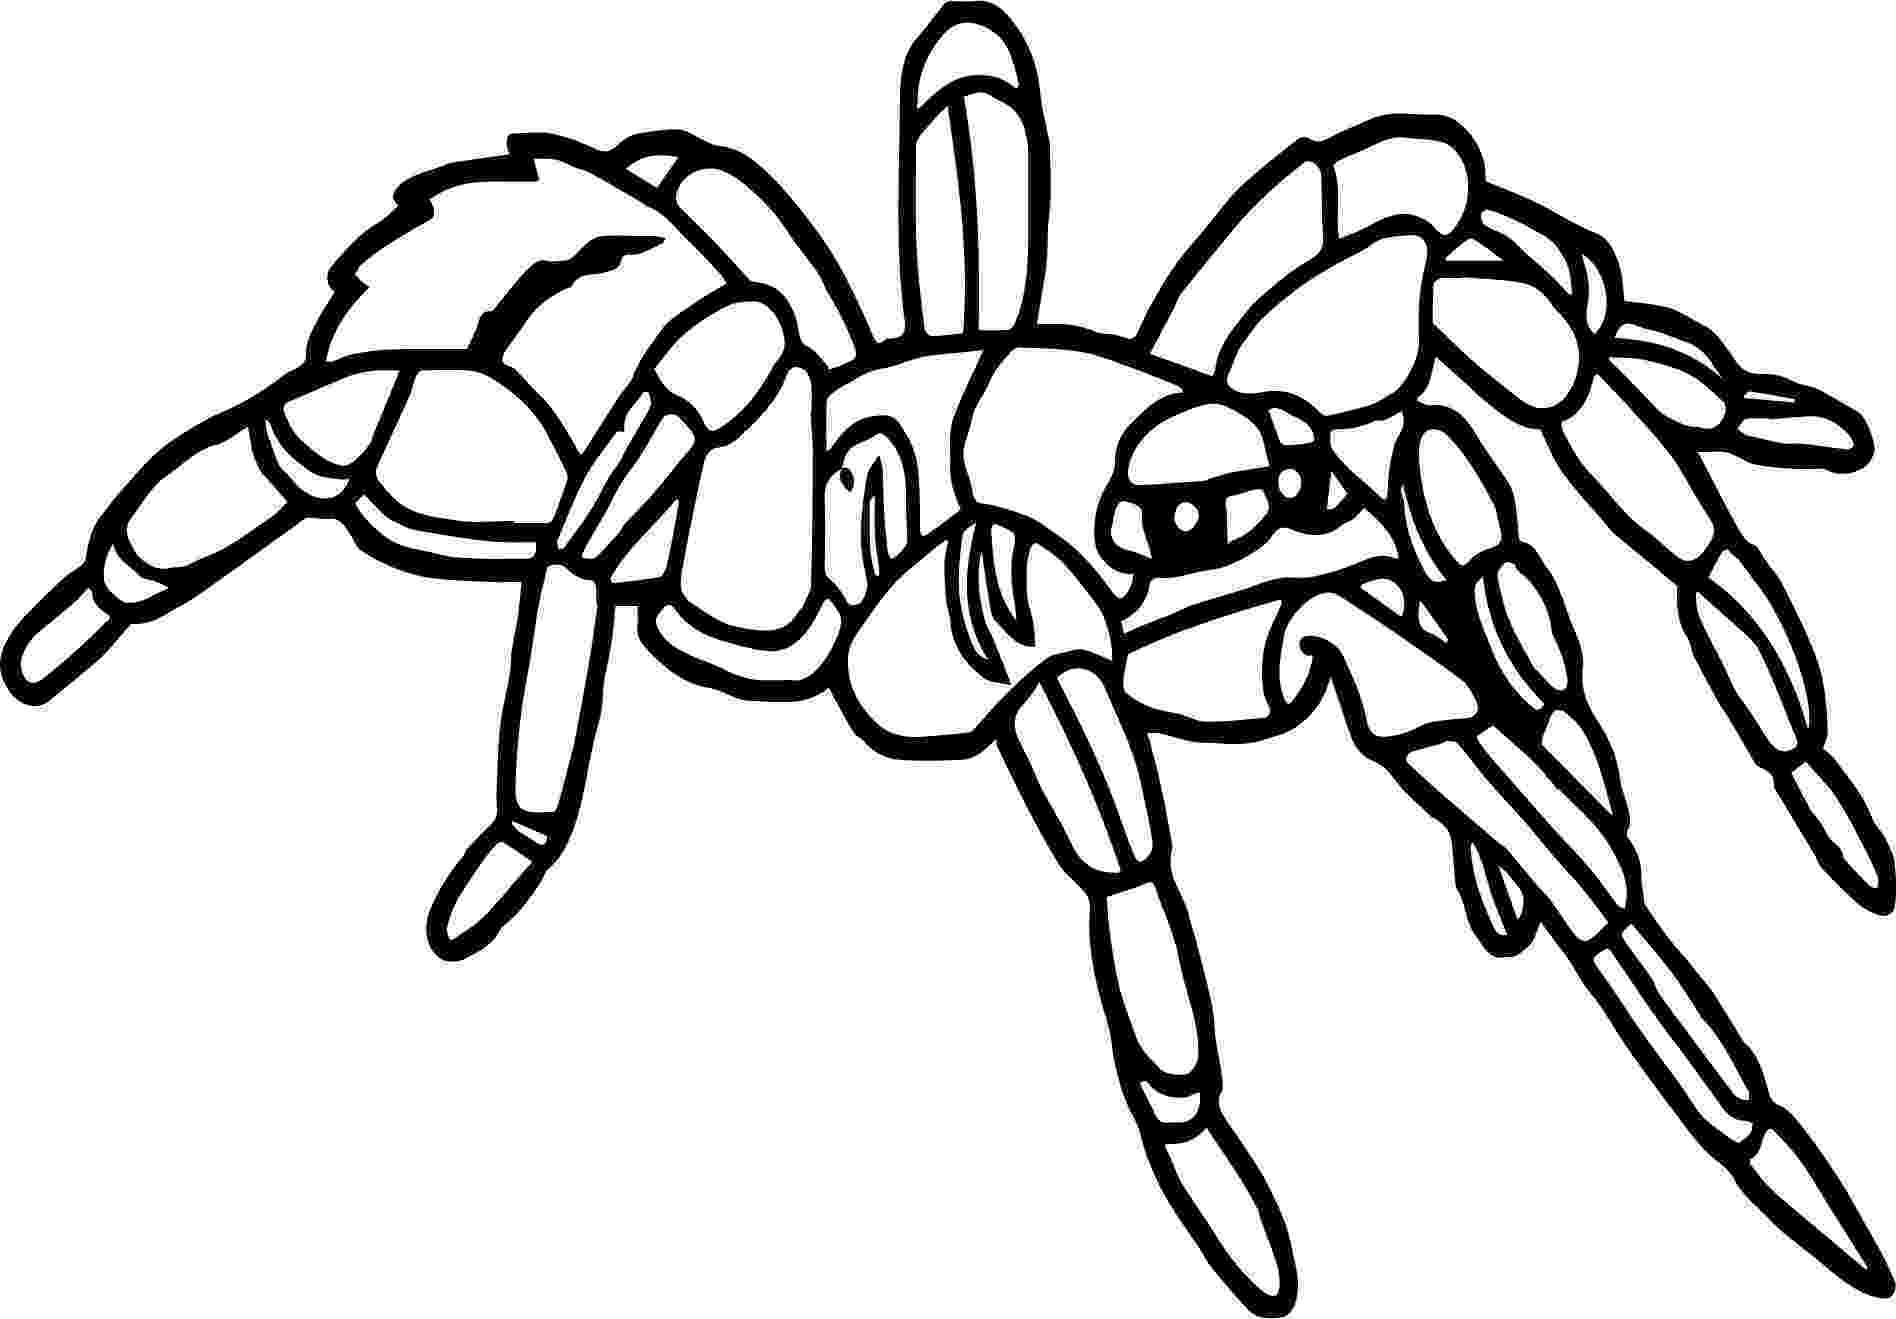 tarantula coloring page rainforest tarantula coloring page wecoloringpagecom tarantula page coloring